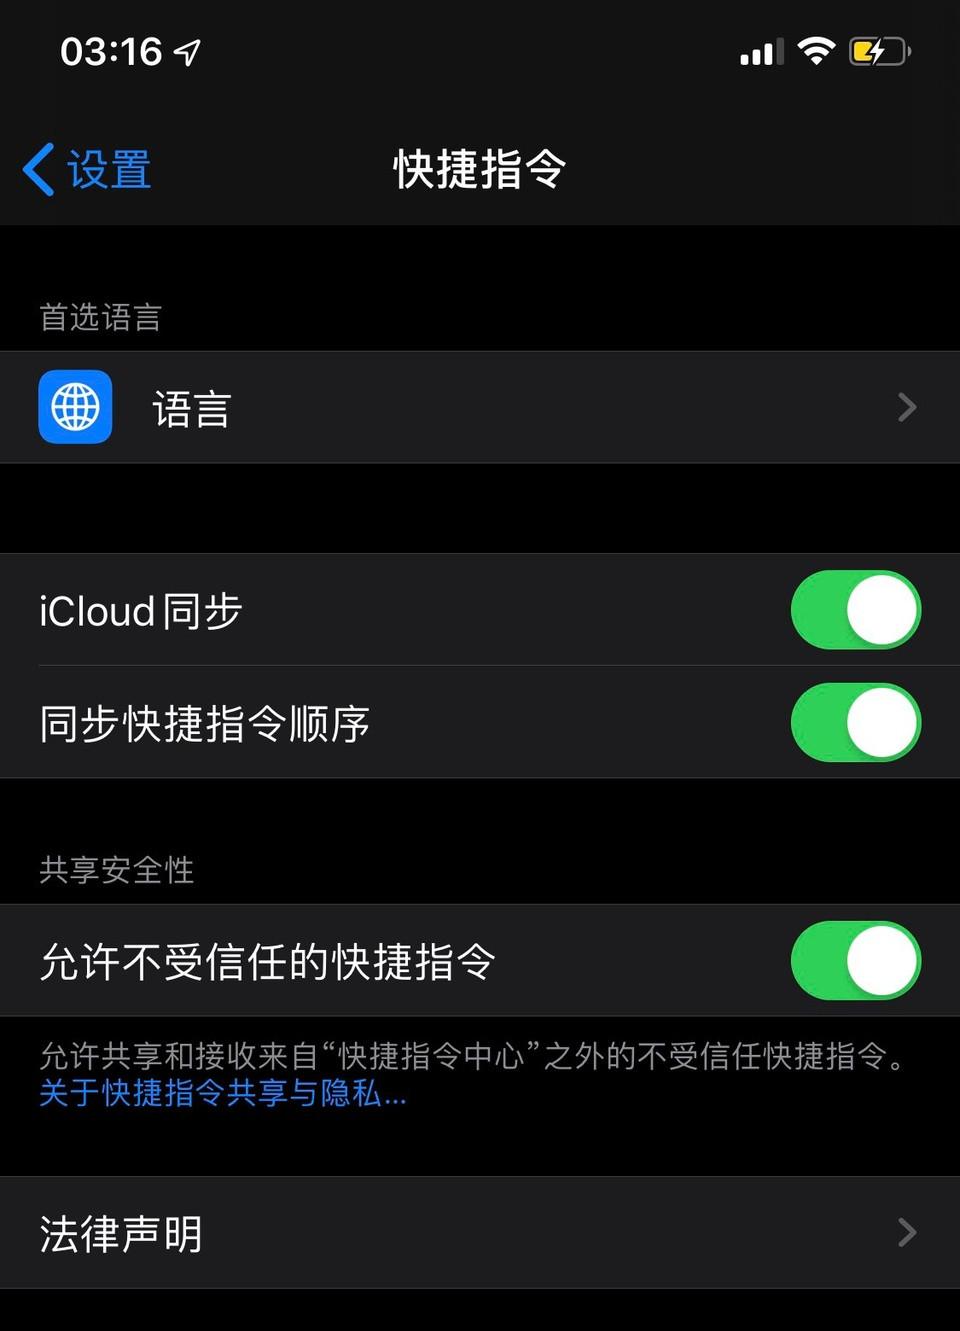 iOS 13 快捷指令无法运行的解决办法